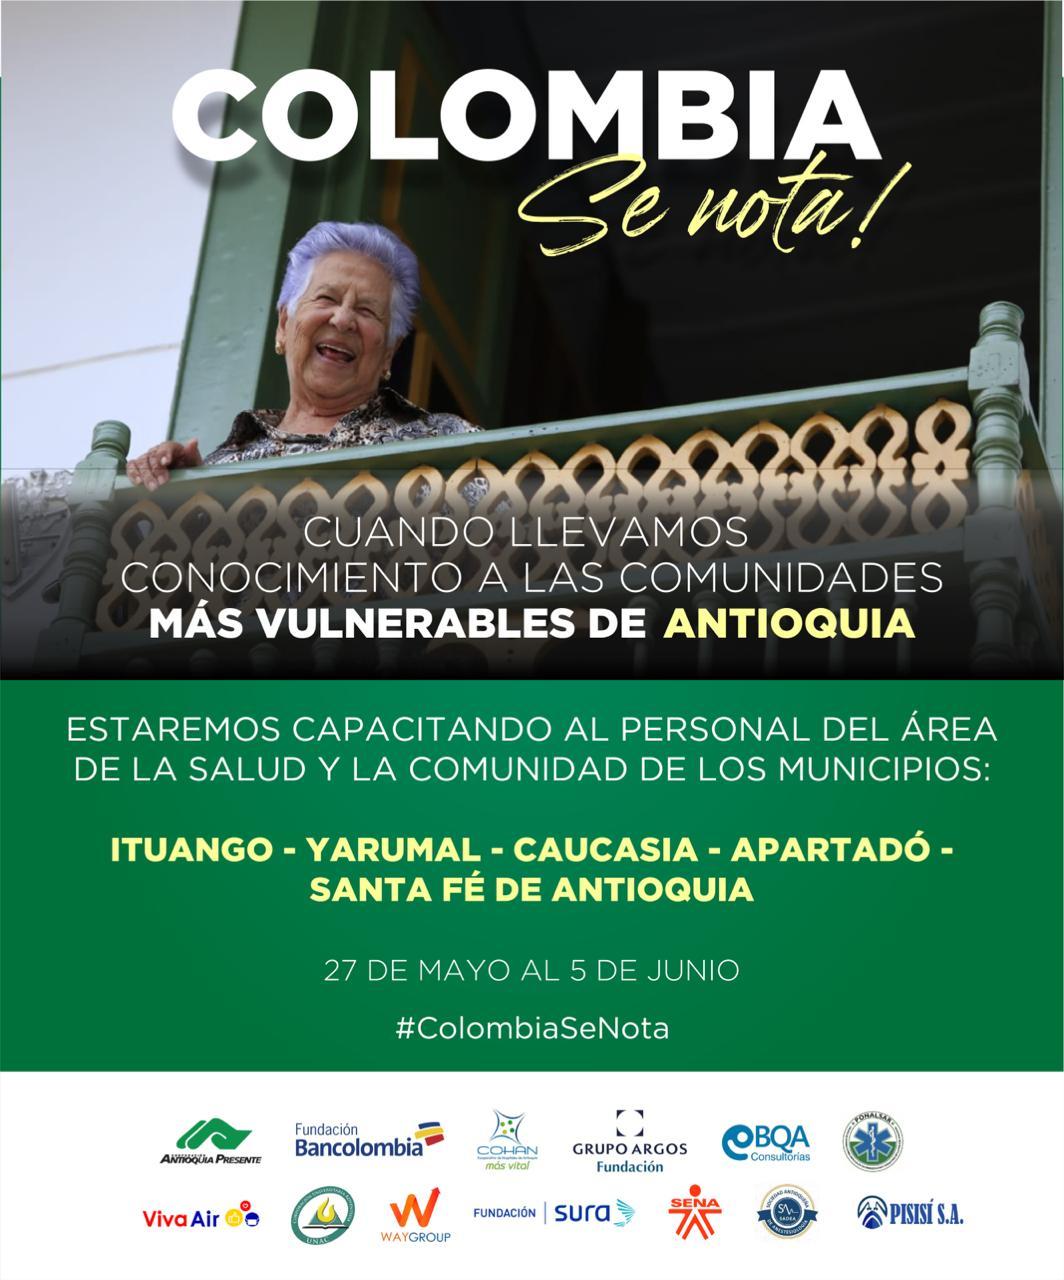 Por Ituago continuan las caravanas humanitaria para llevar capacitación médica a cuatro municipios de Antioquia